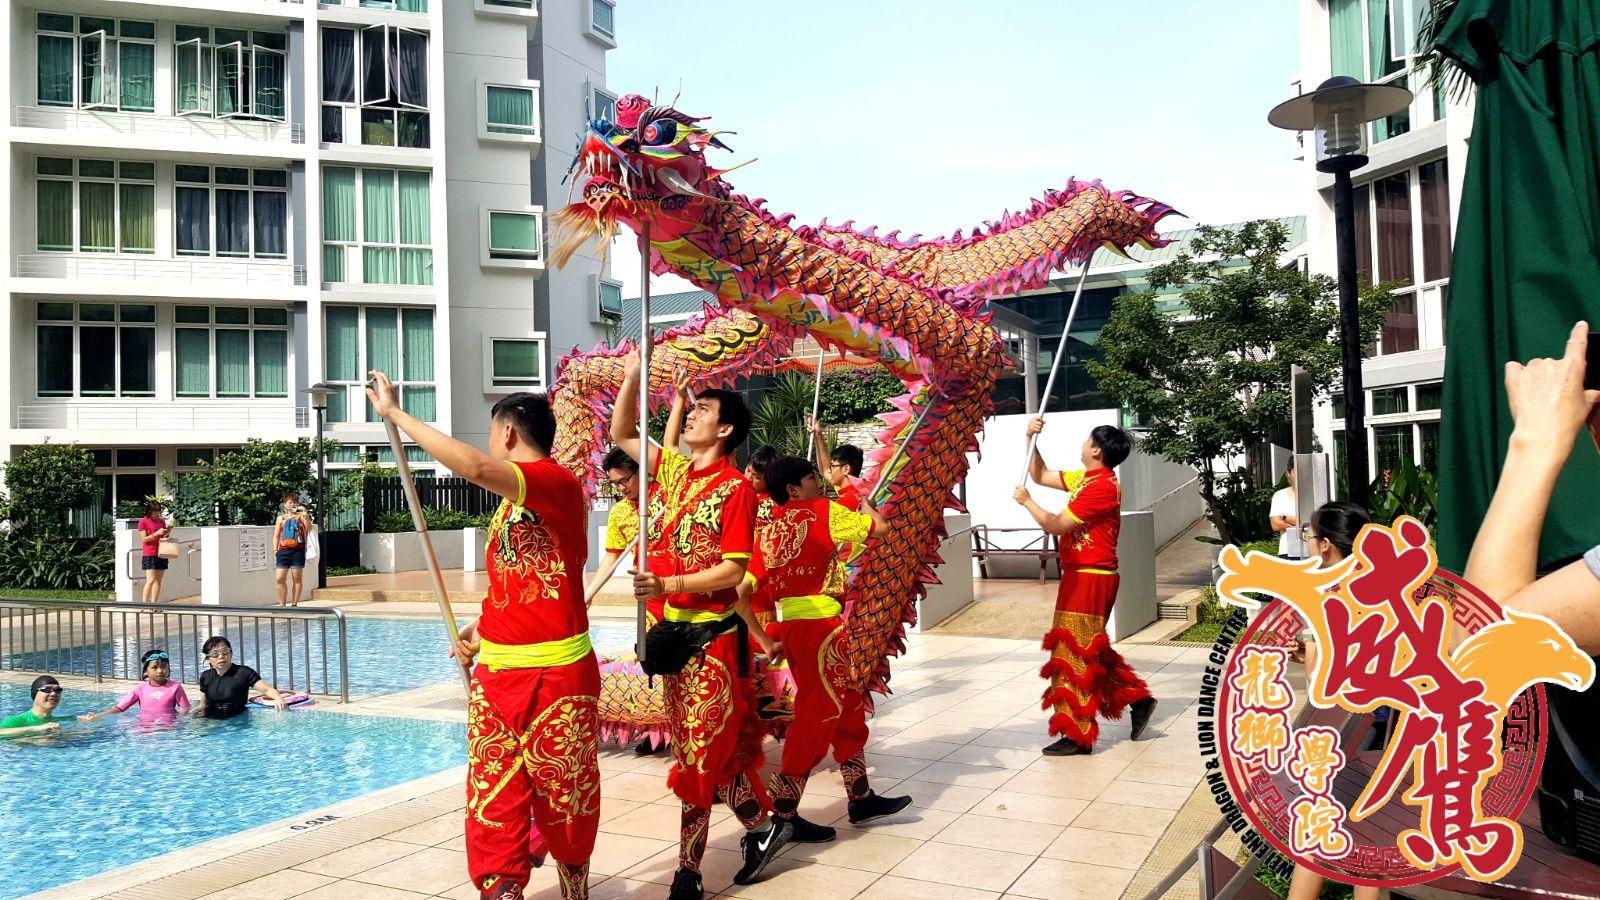 Dragon Dance Performance: - • Acrobatic dragon dance• Luminous dragon dance• L.E.D dragon dance